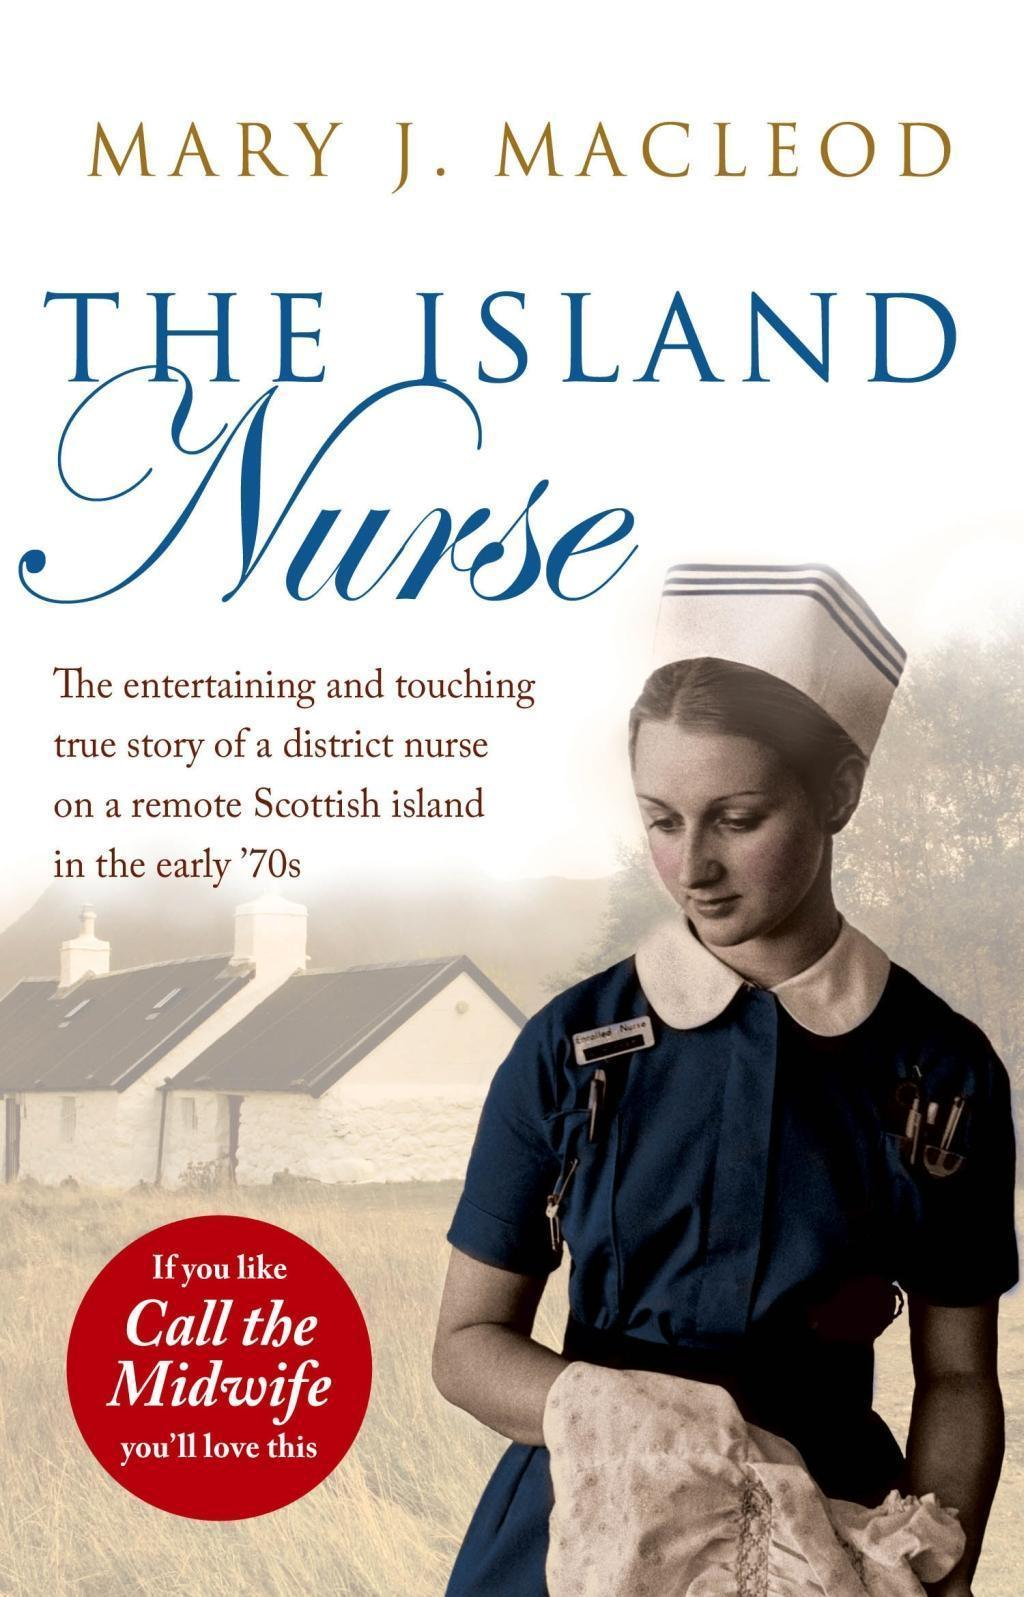 The Island Nurse